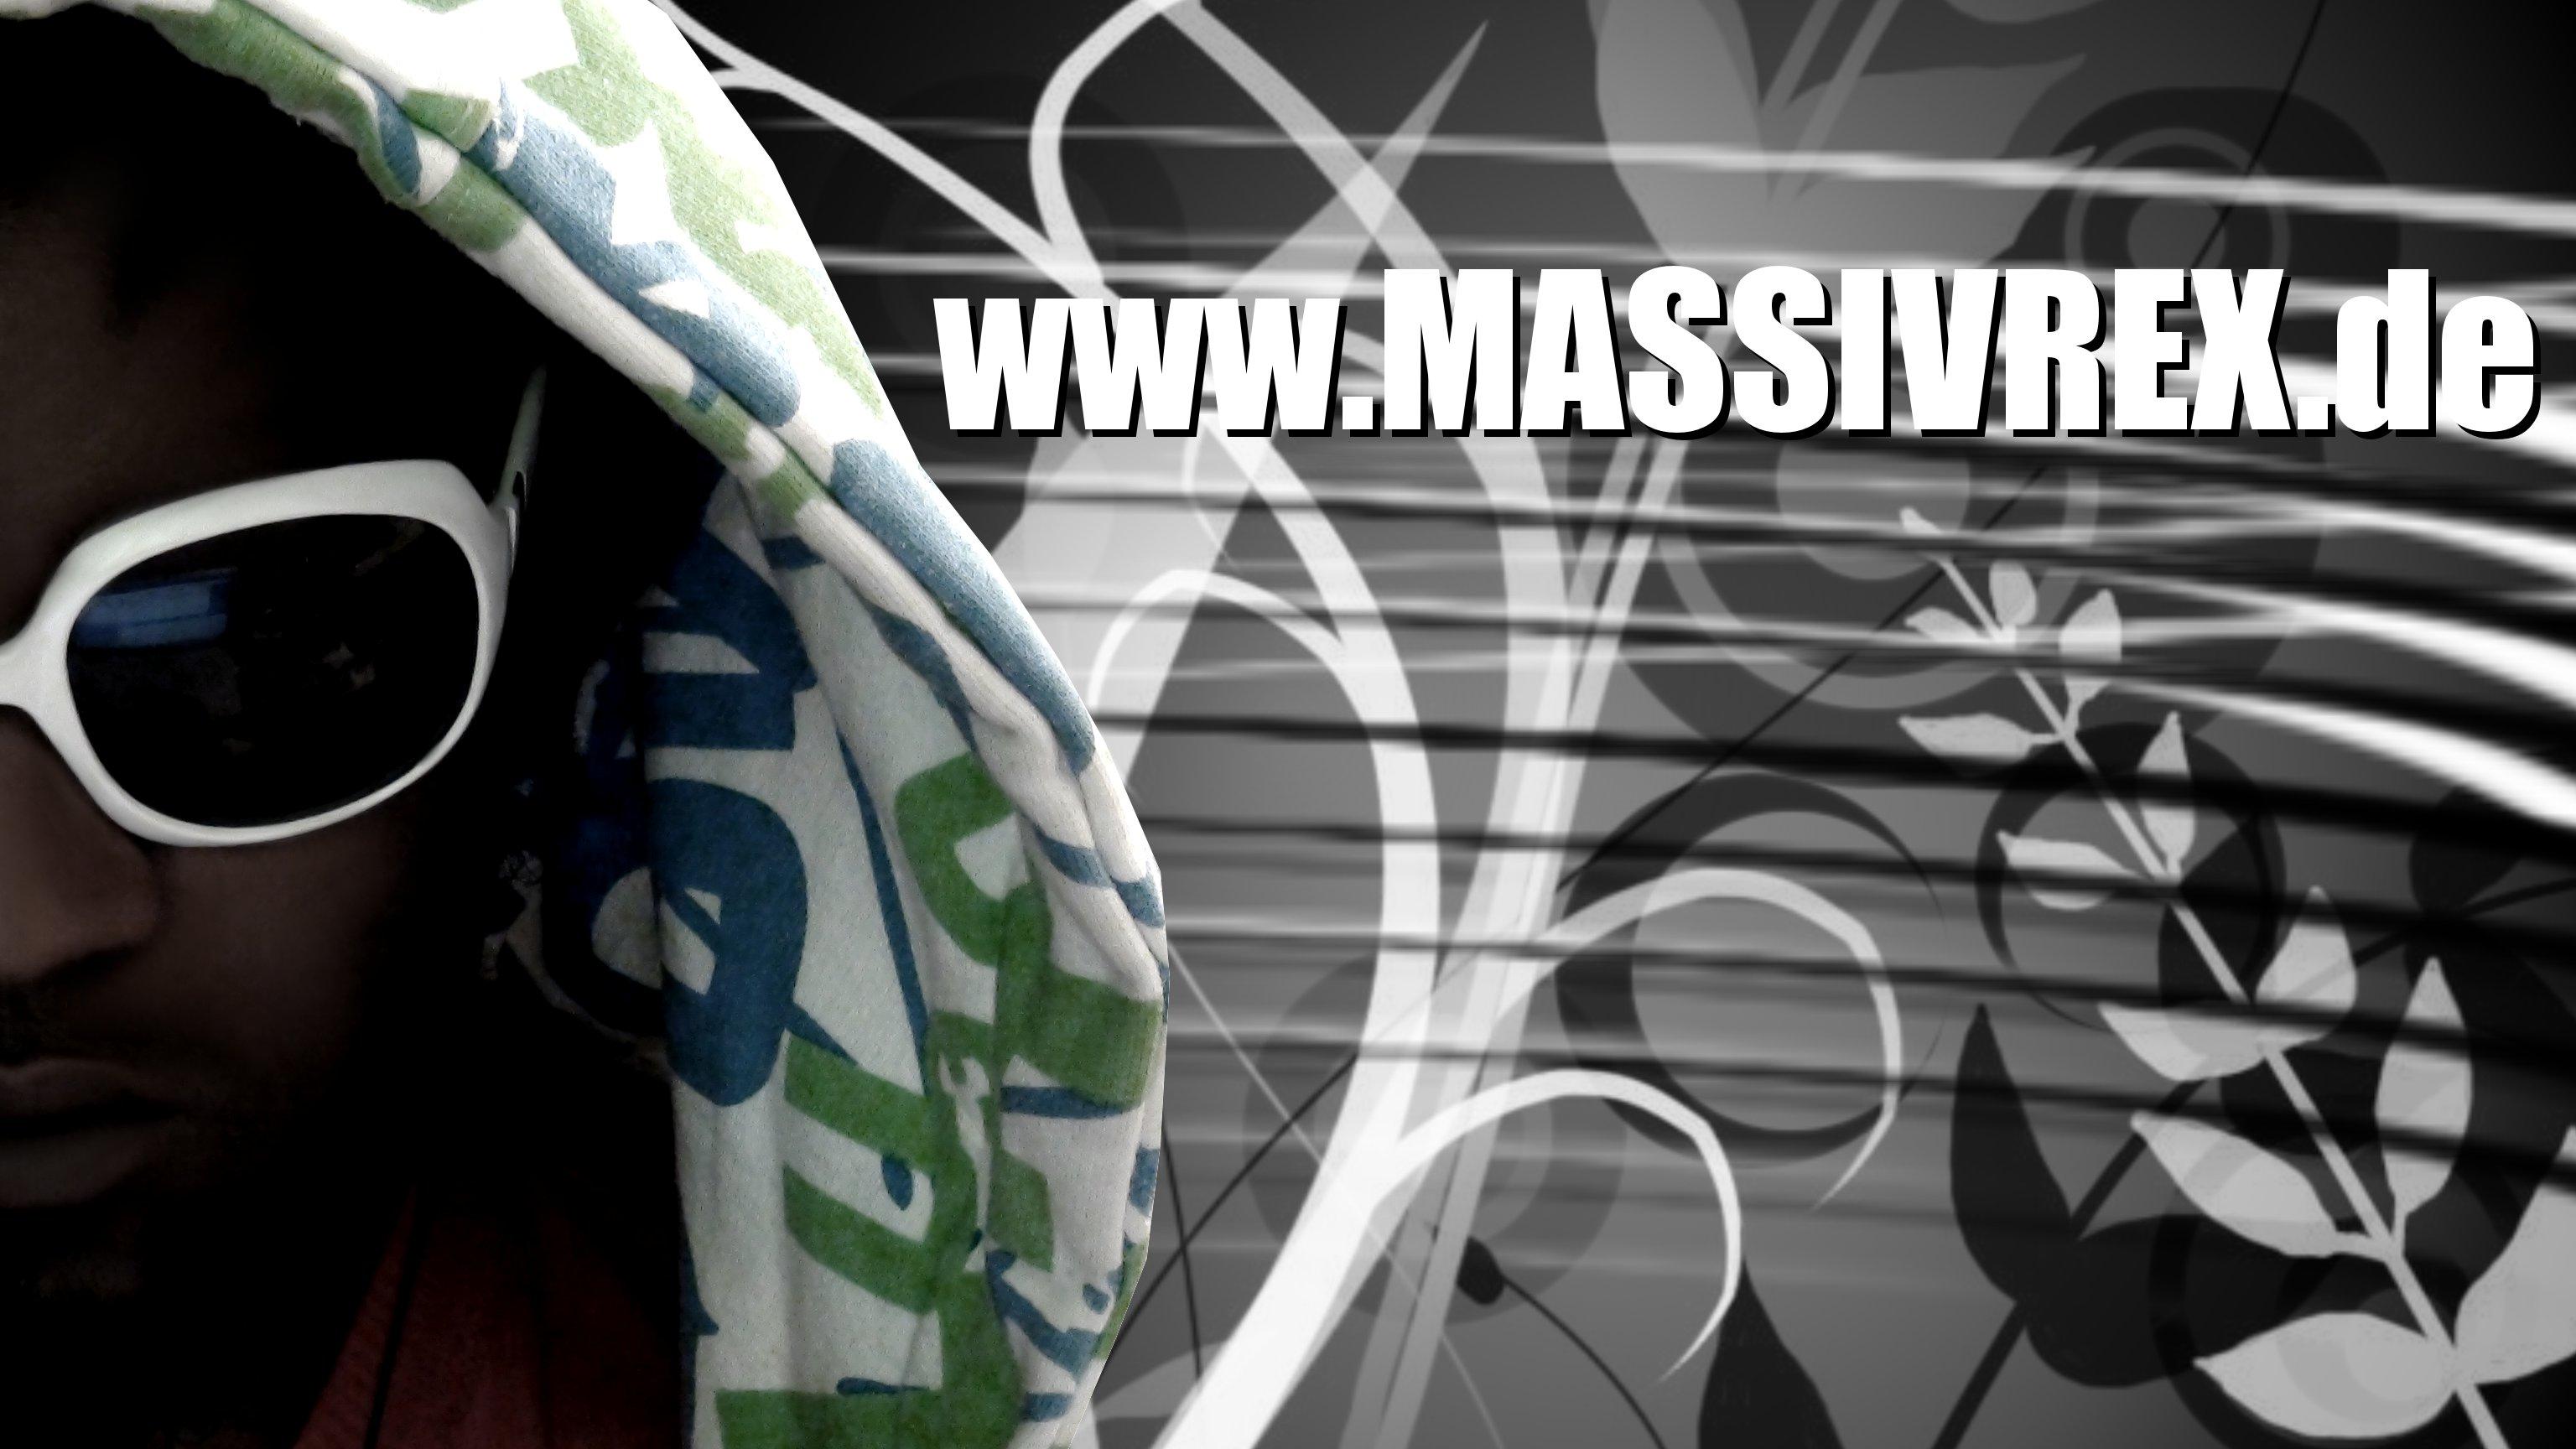 MASSIV REX